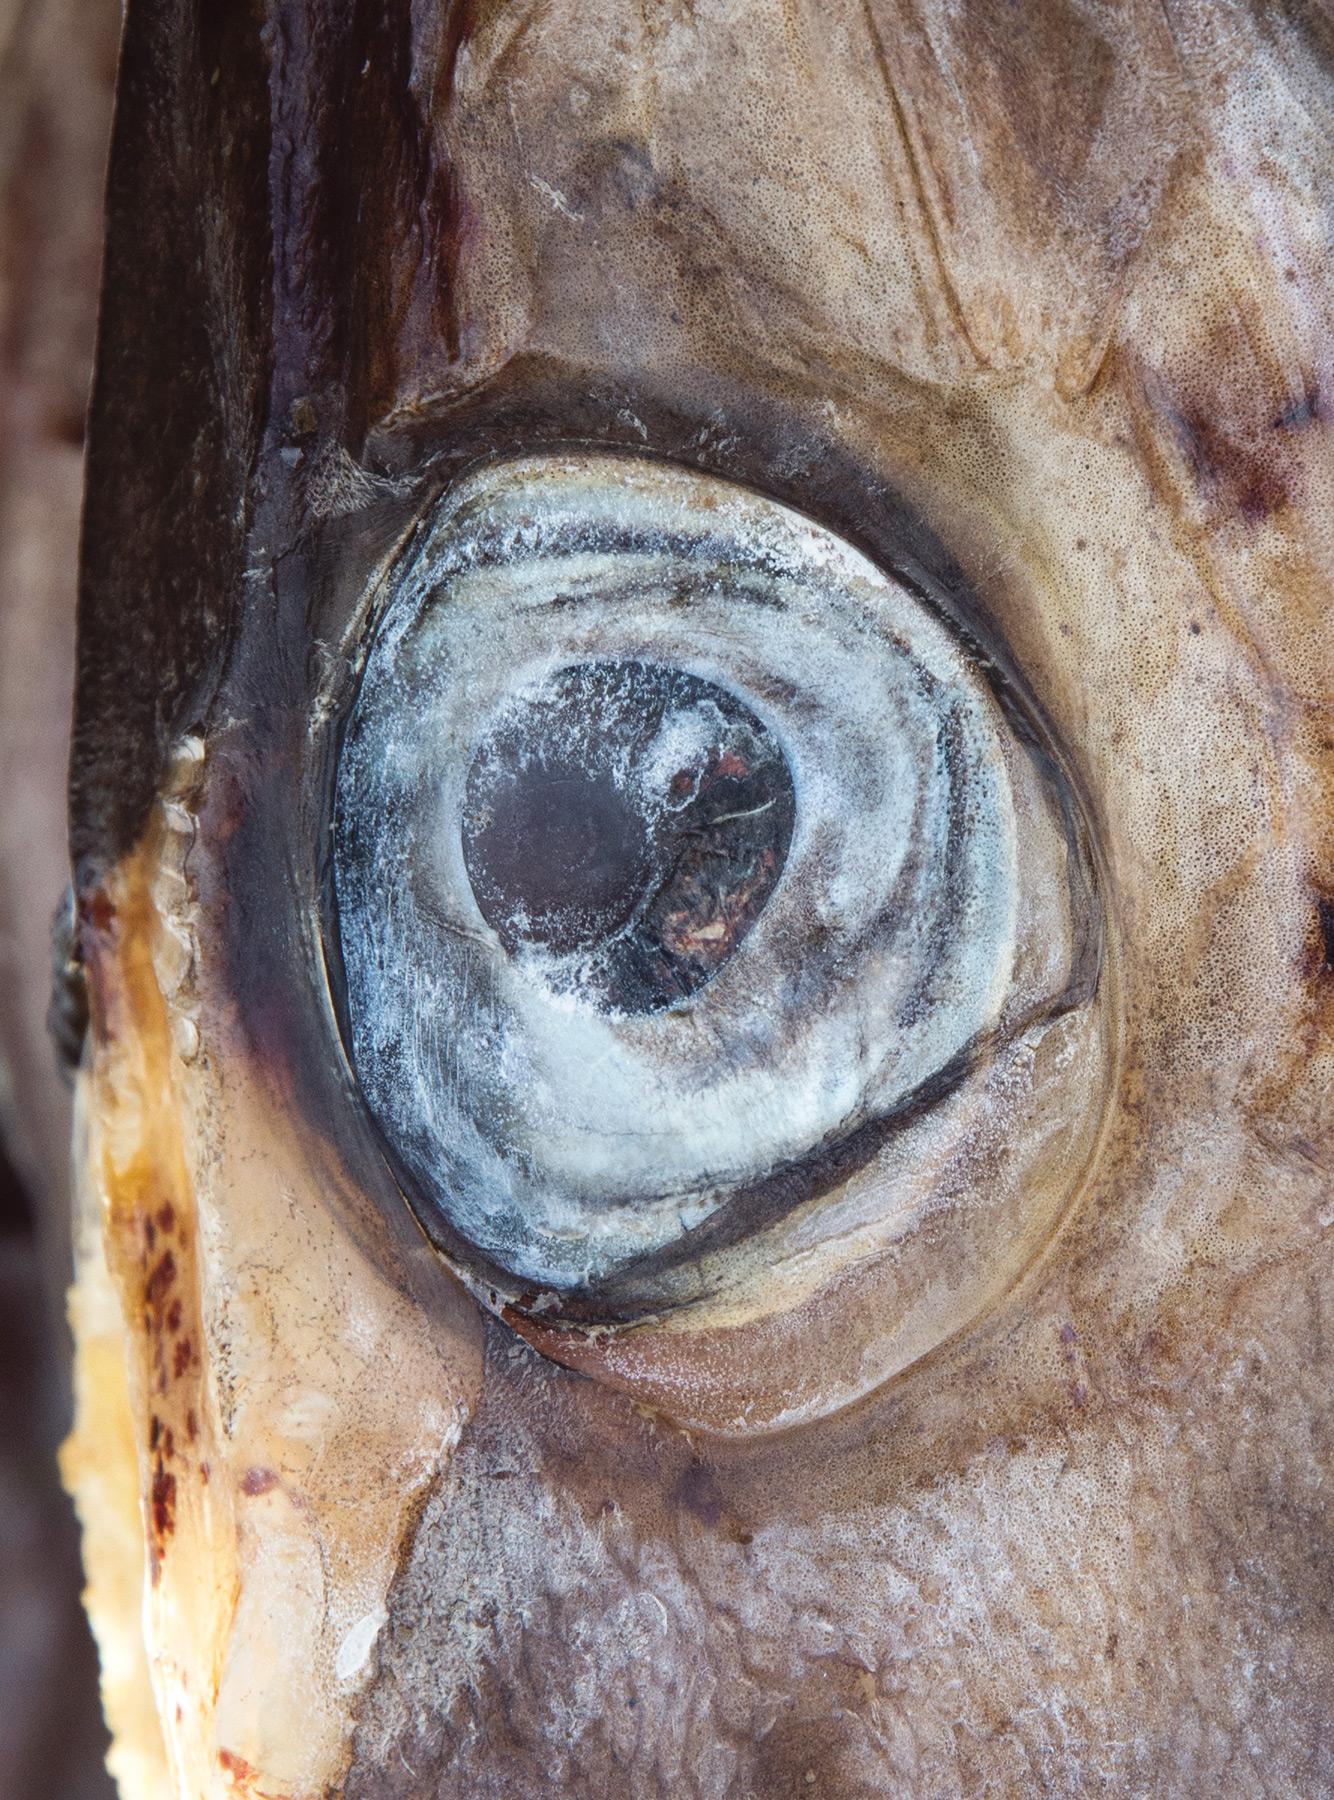 Closeup of fish eye